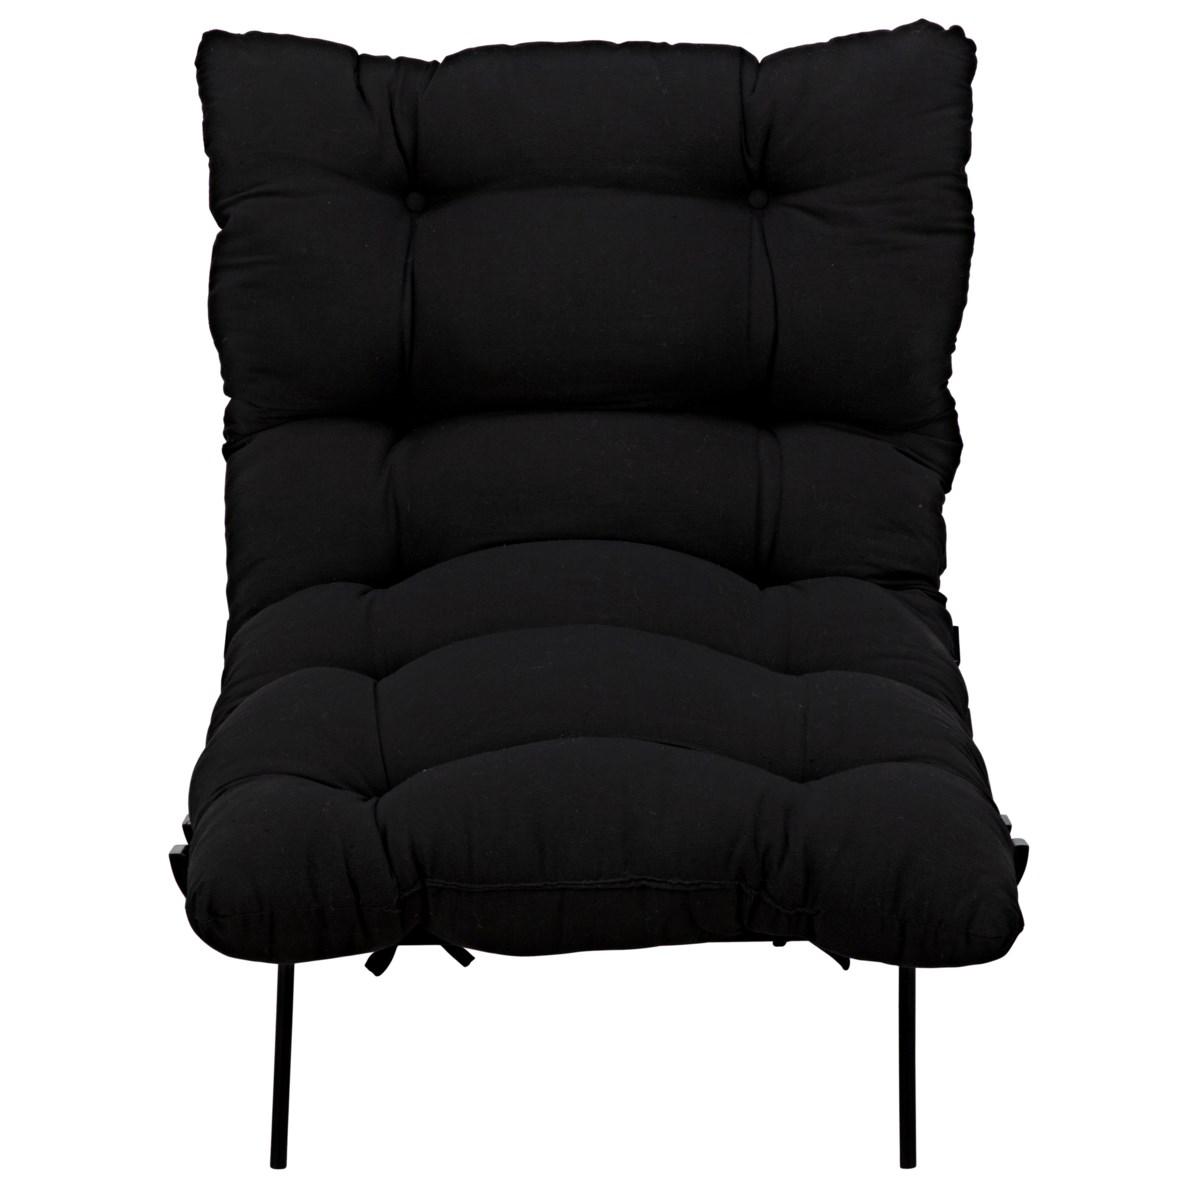 Hanzo Chair w/Metal Legs, Charcoal Black